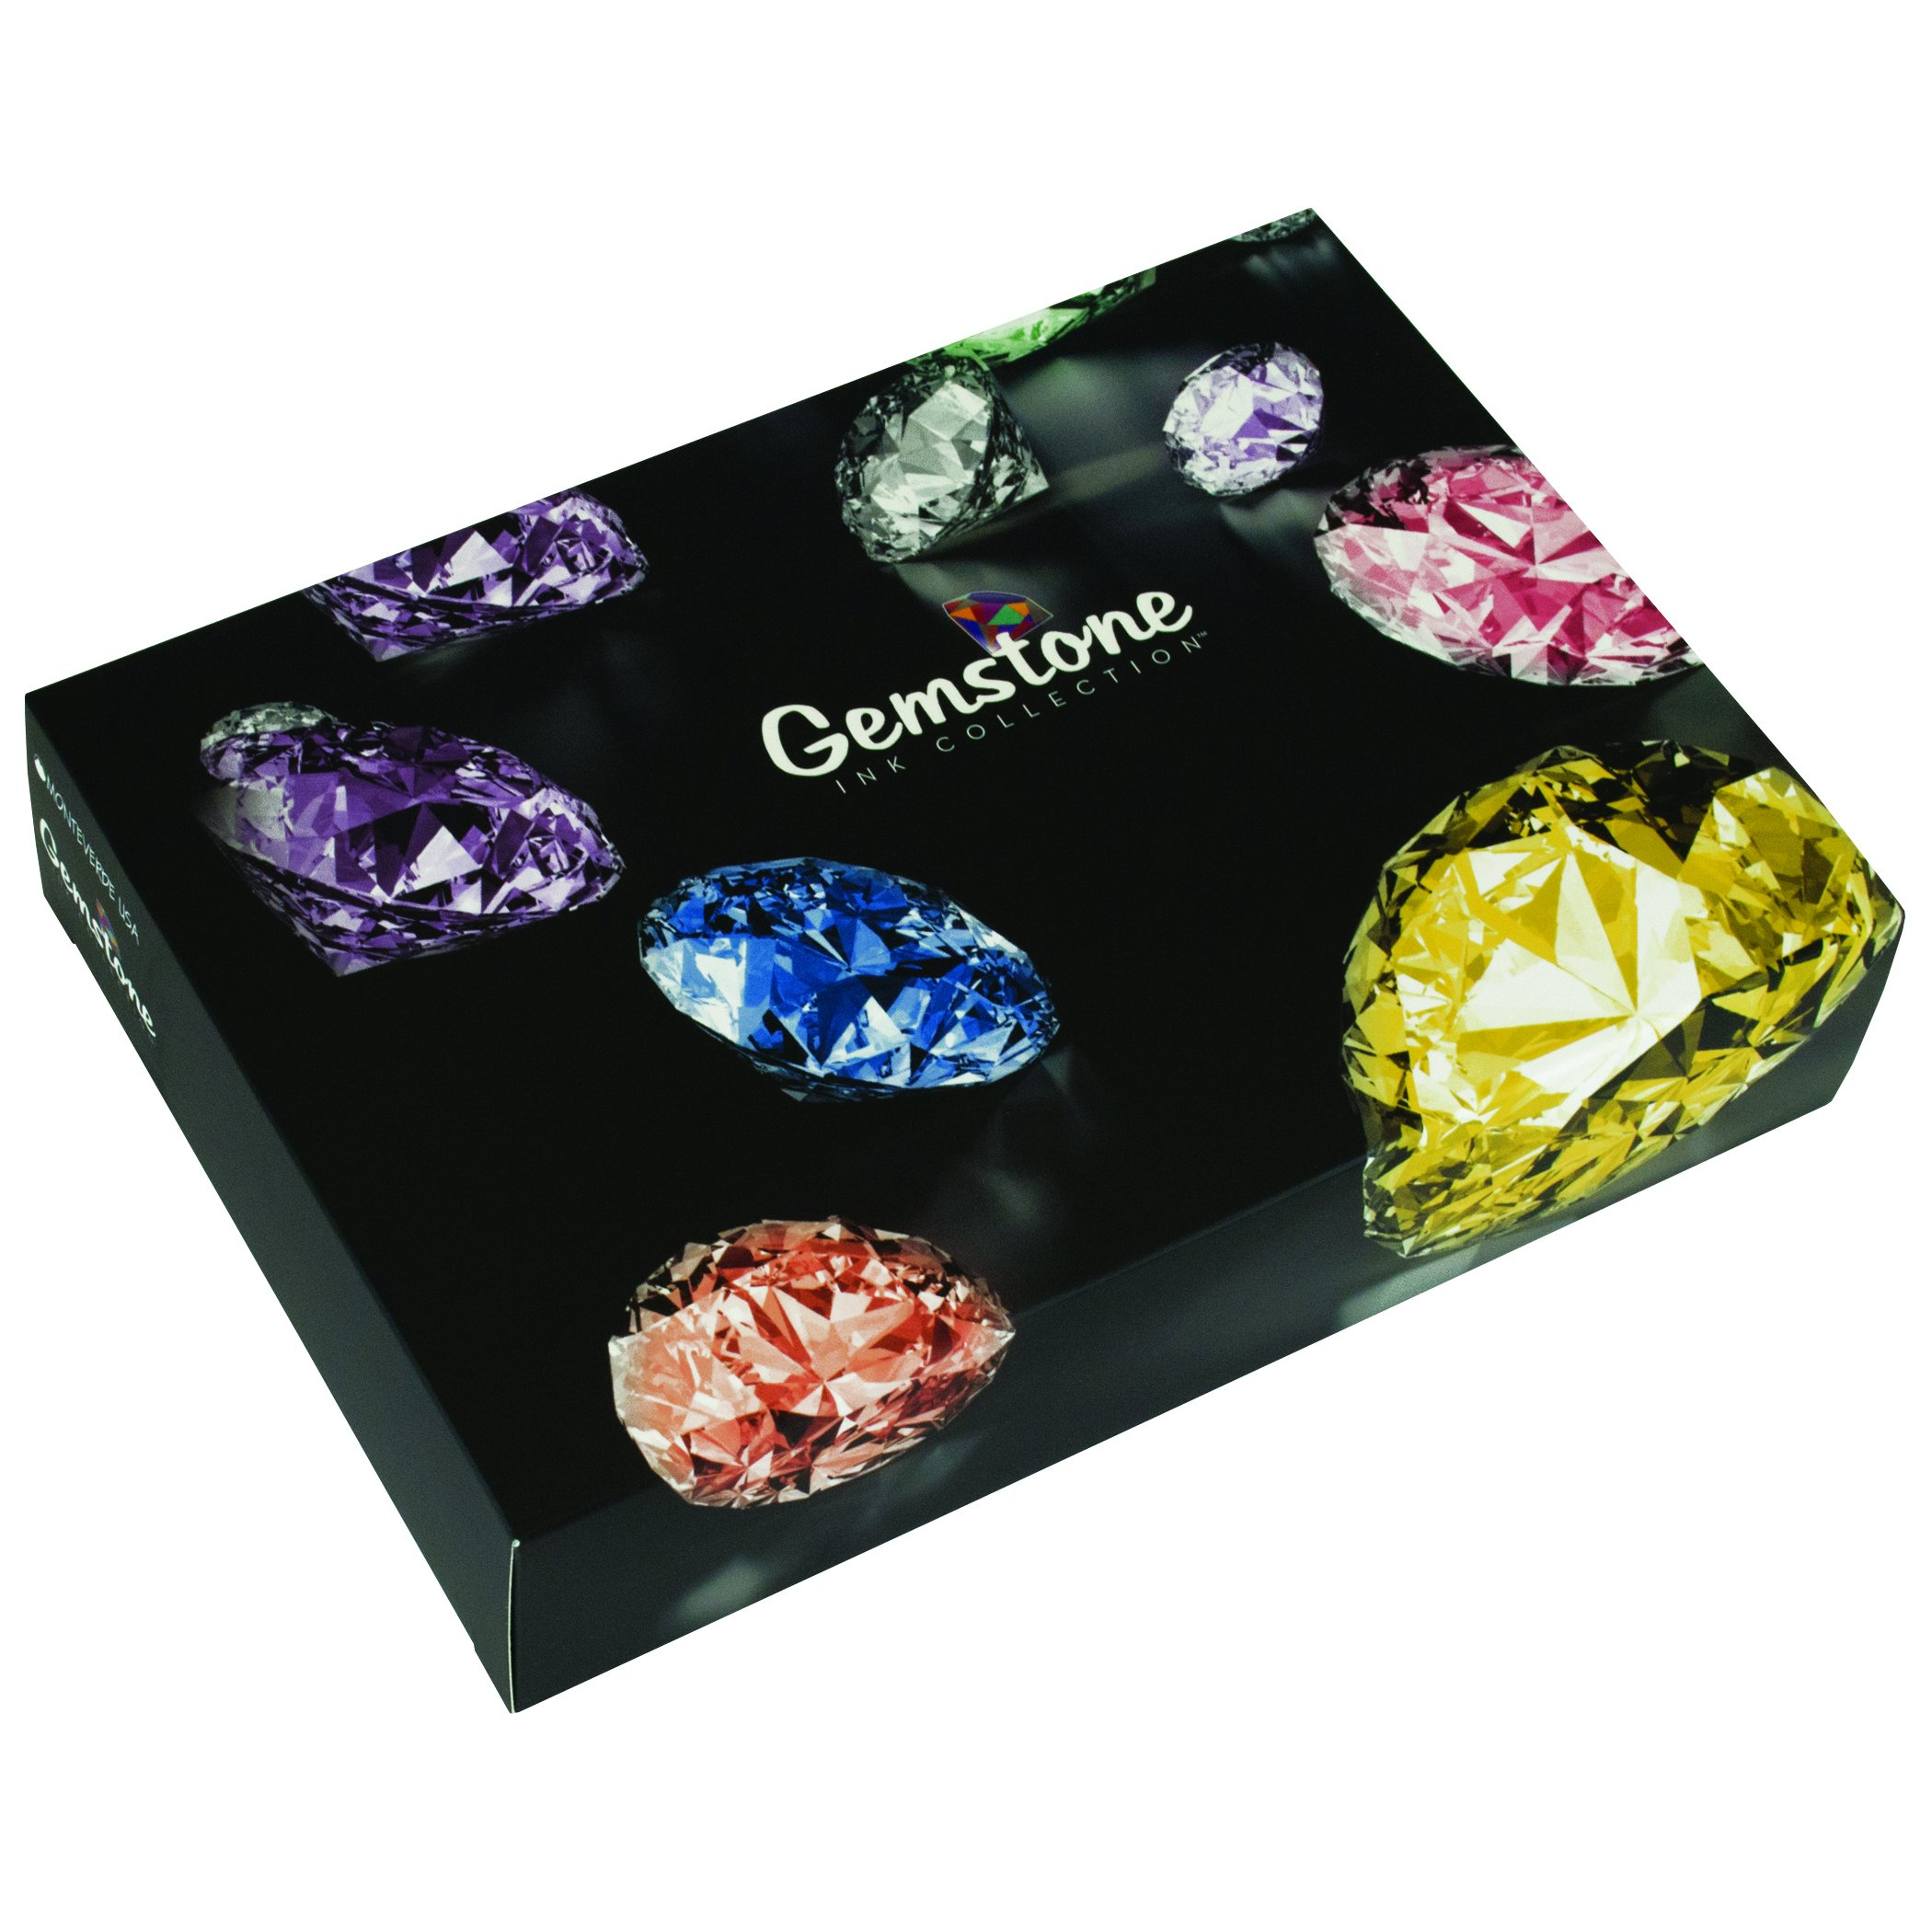 MONTEVERDE Gemstone Ink Collection Gift Set Fountain Pen Refill, Various Colors (MV12373) by Monteverde (Image #2)